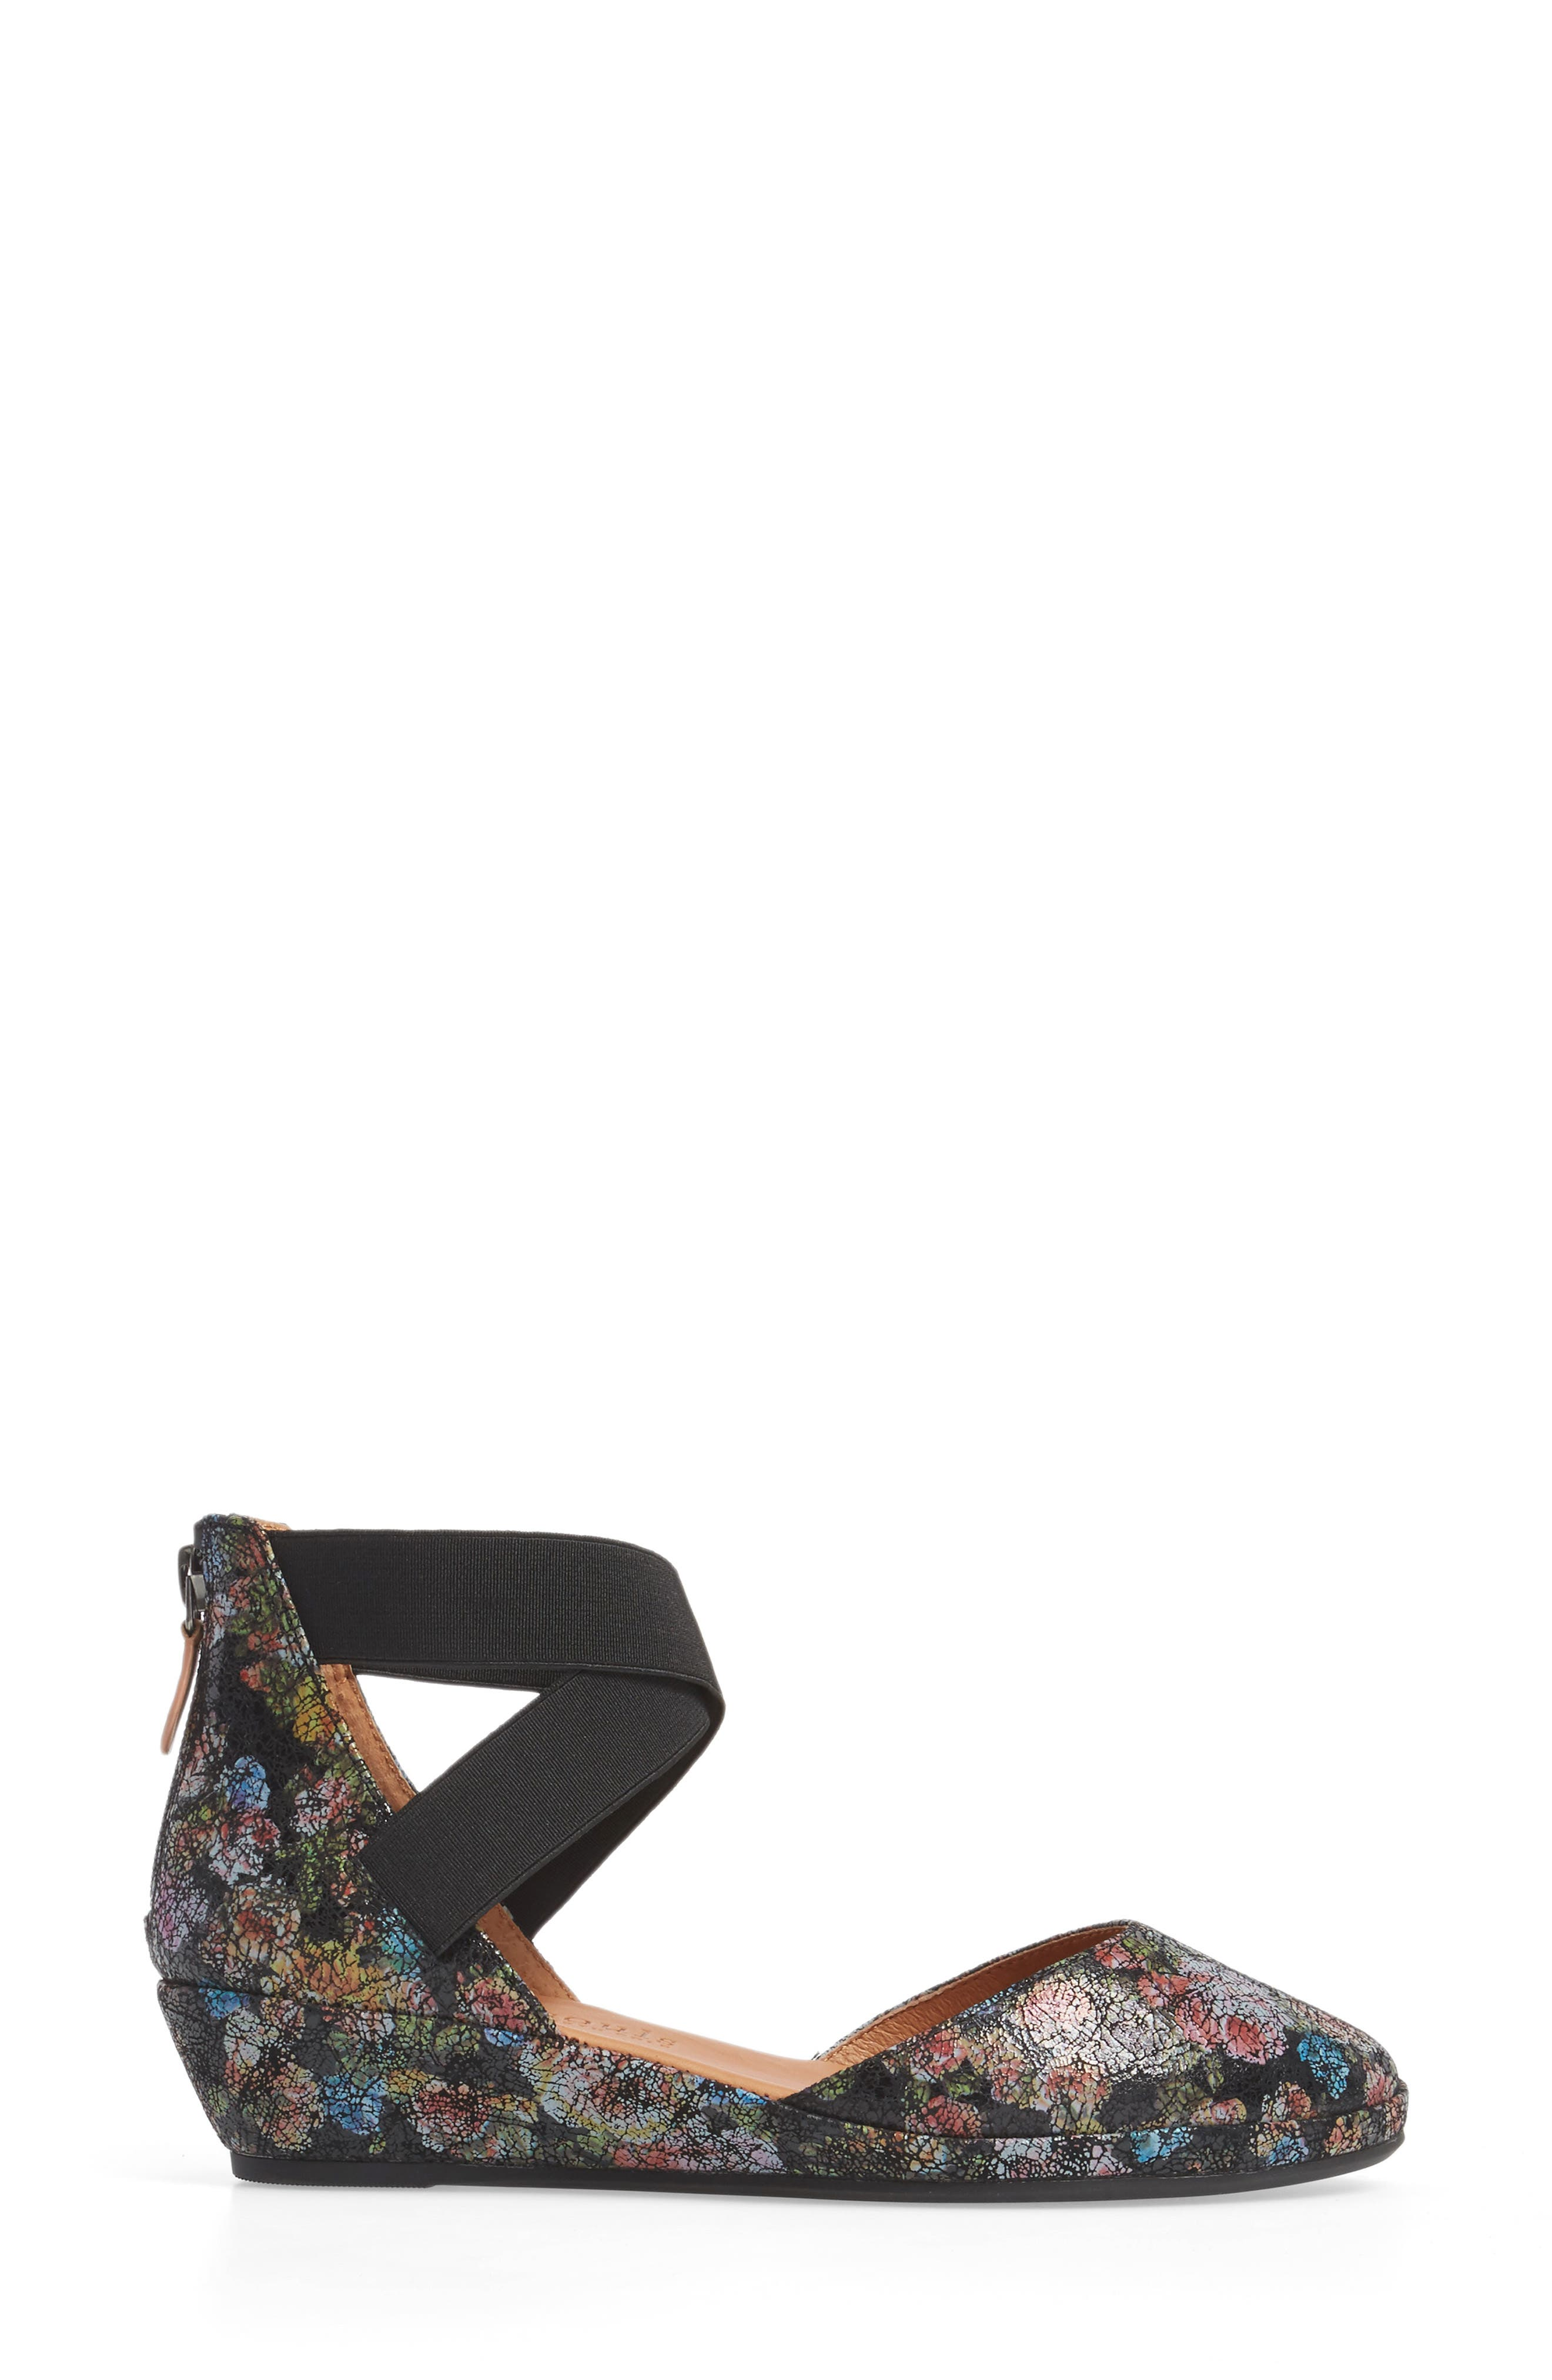 Alternate Image 3  - Gentle Souls 'Noa' Elastic Strap d'Orsay Sandal (Women)